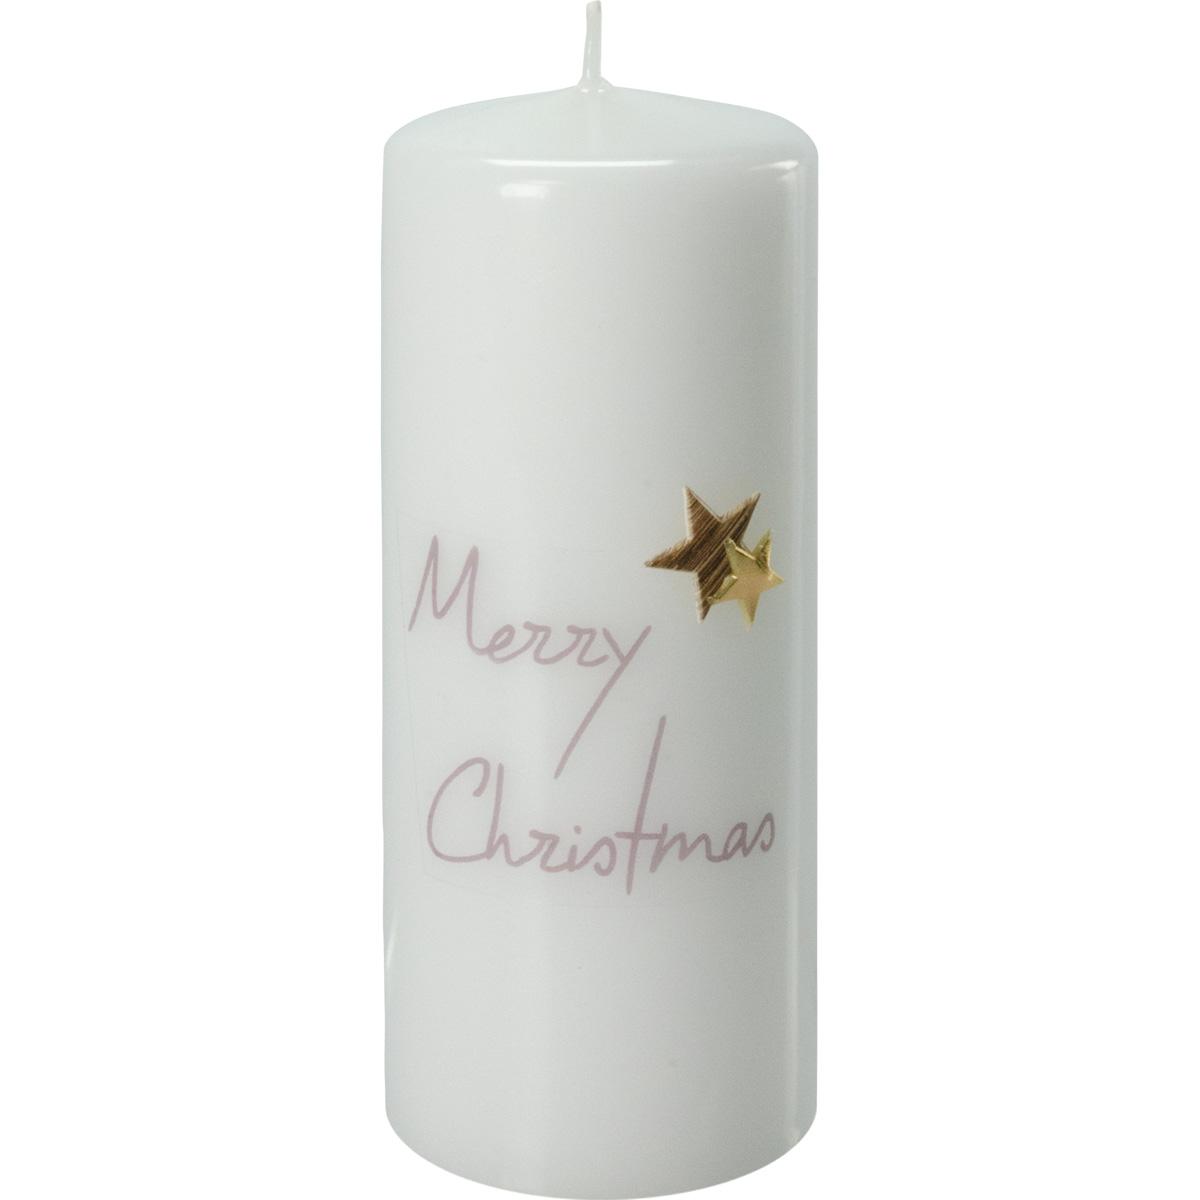 Weihnachtskerze, 2768, 15 x 6 cm, weiß, Merry Christmas